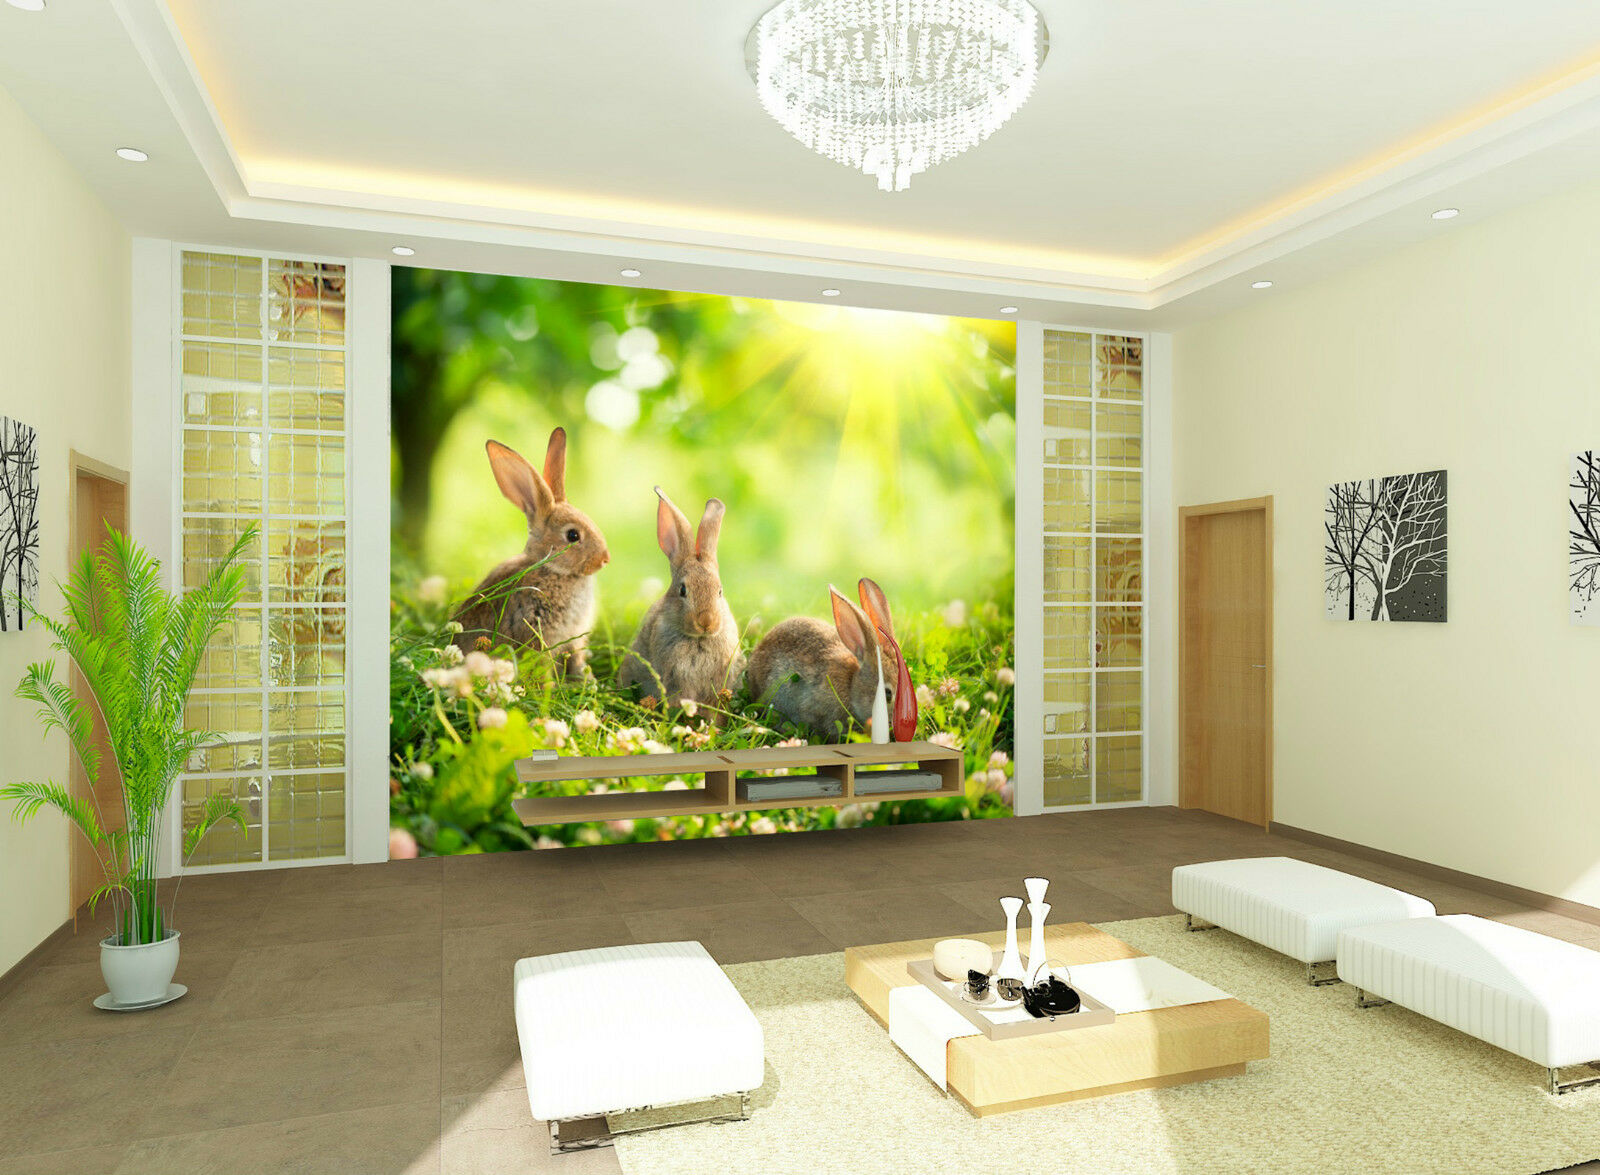 3D Kaninchen 6554 Fototapeten Wandbild Fototapete Bild Tapete Familie Kinder DE